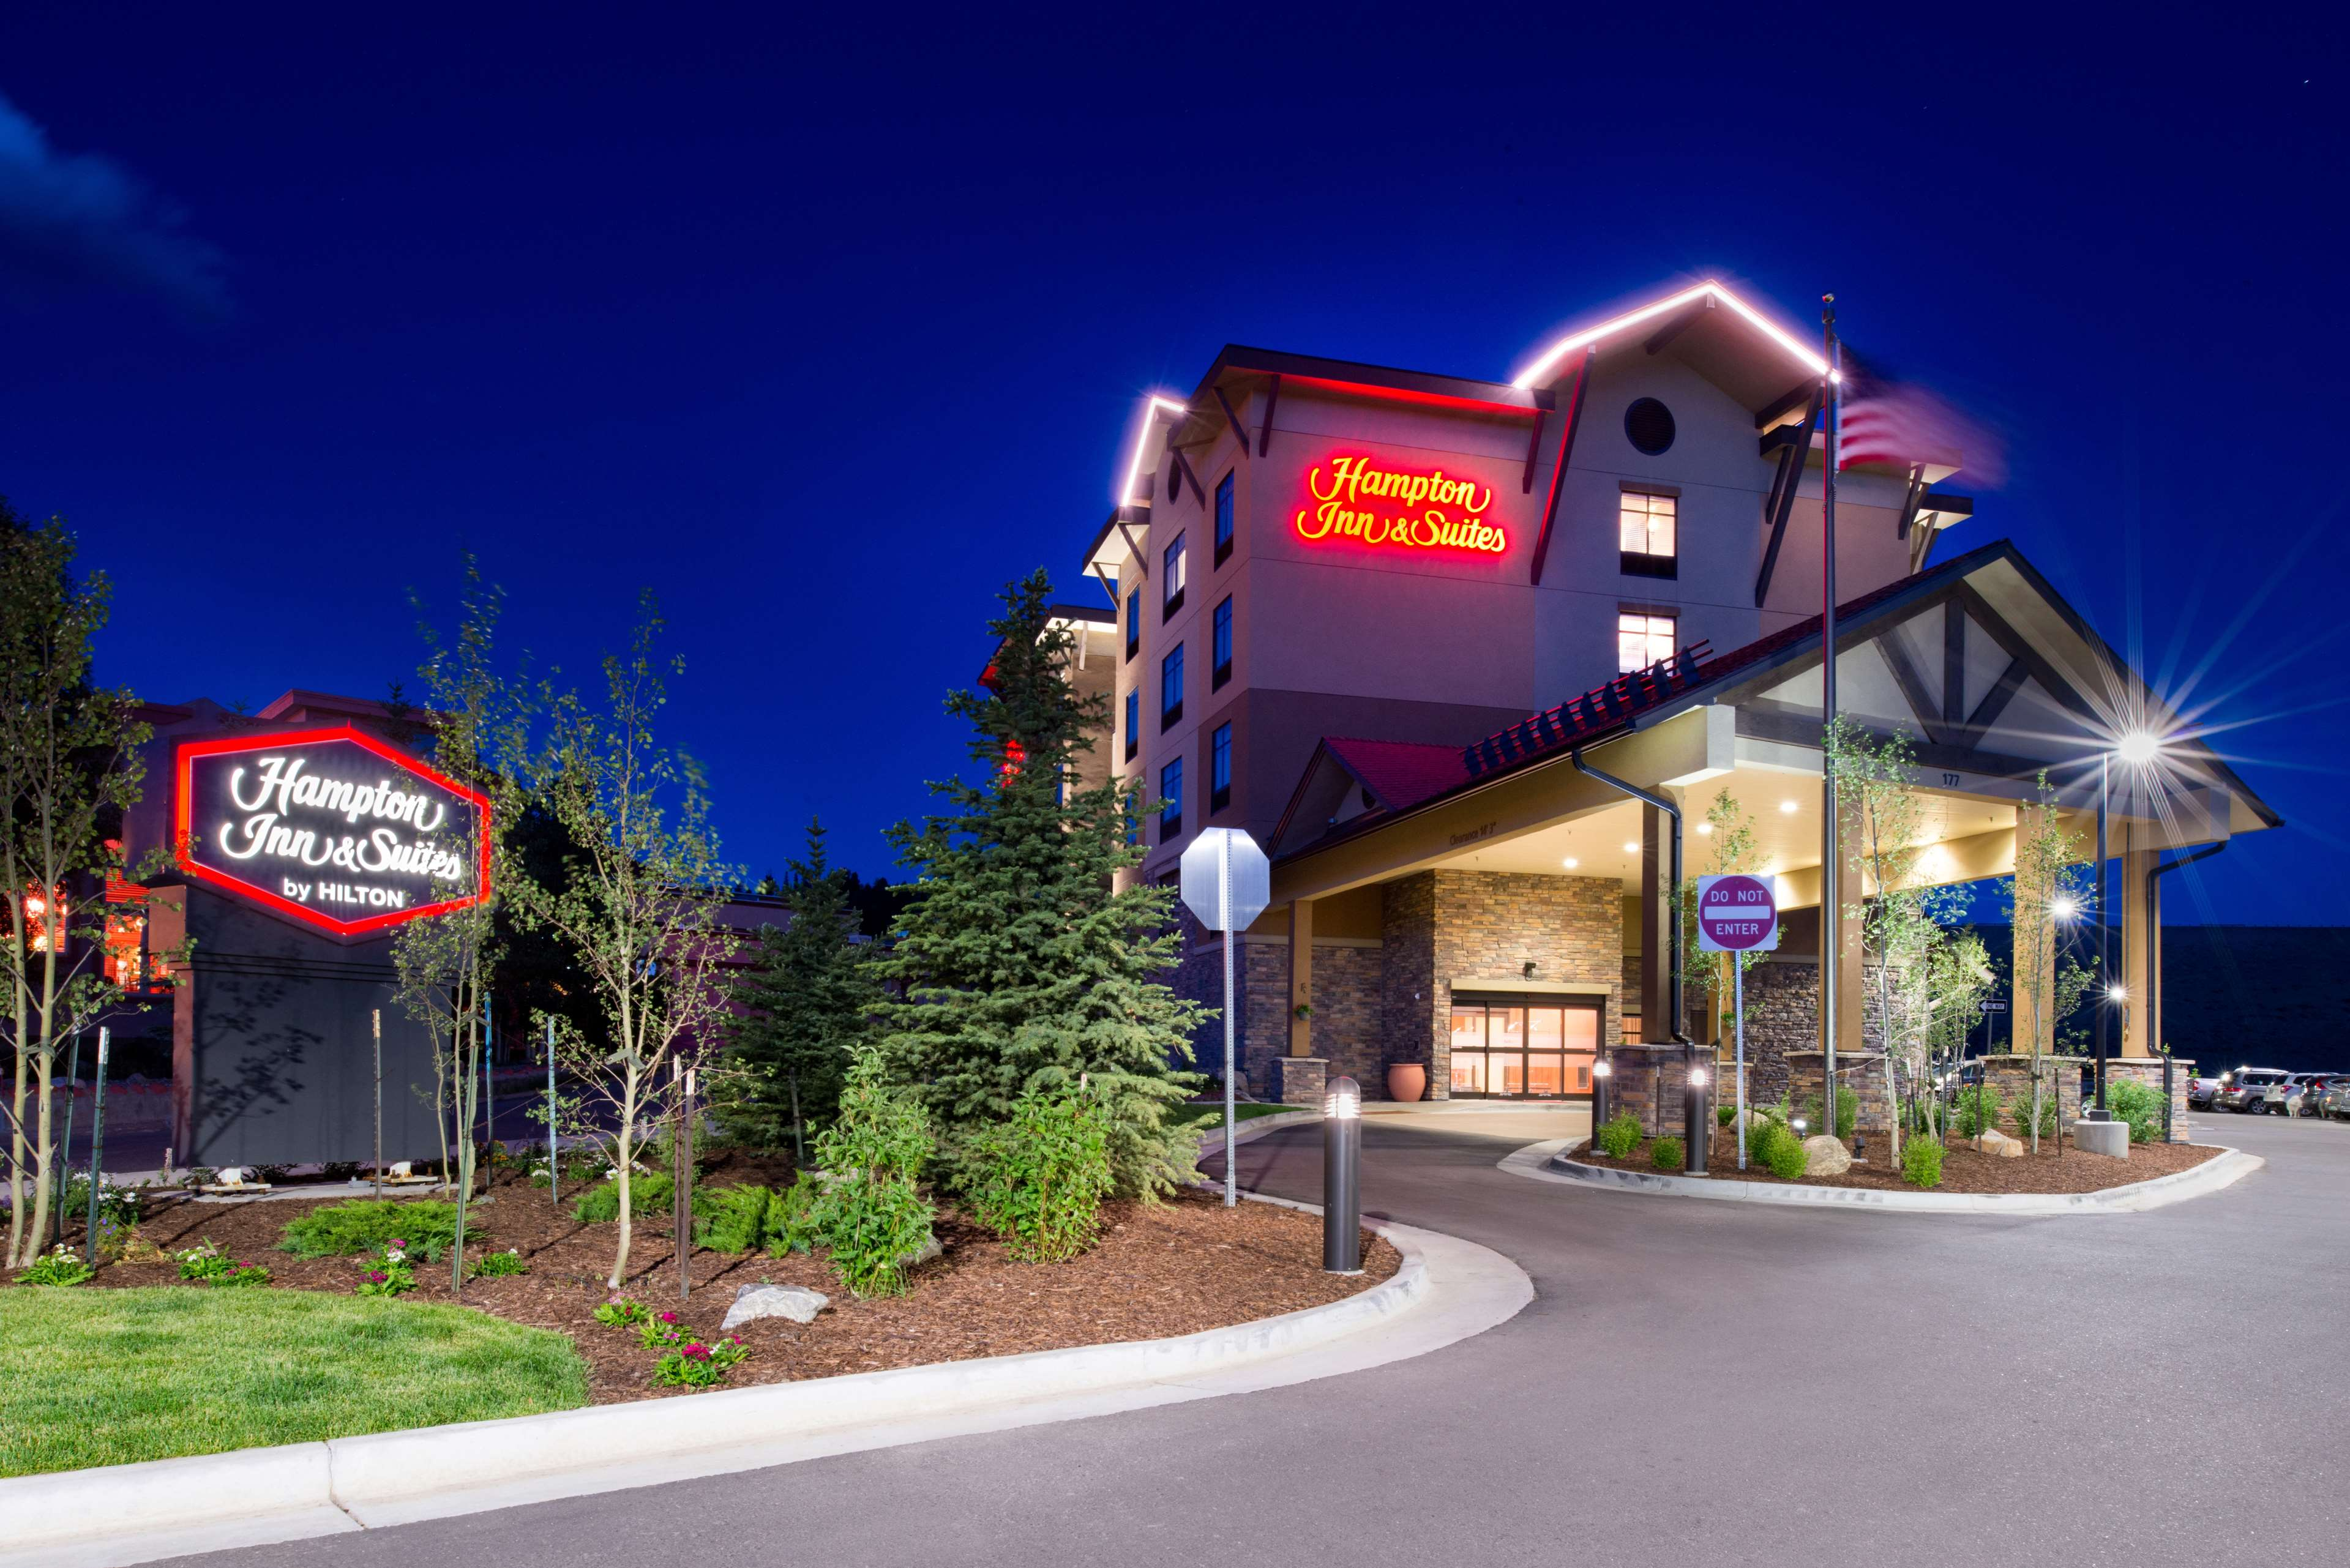 Hampton Inn & Suites Silverthorne image 0